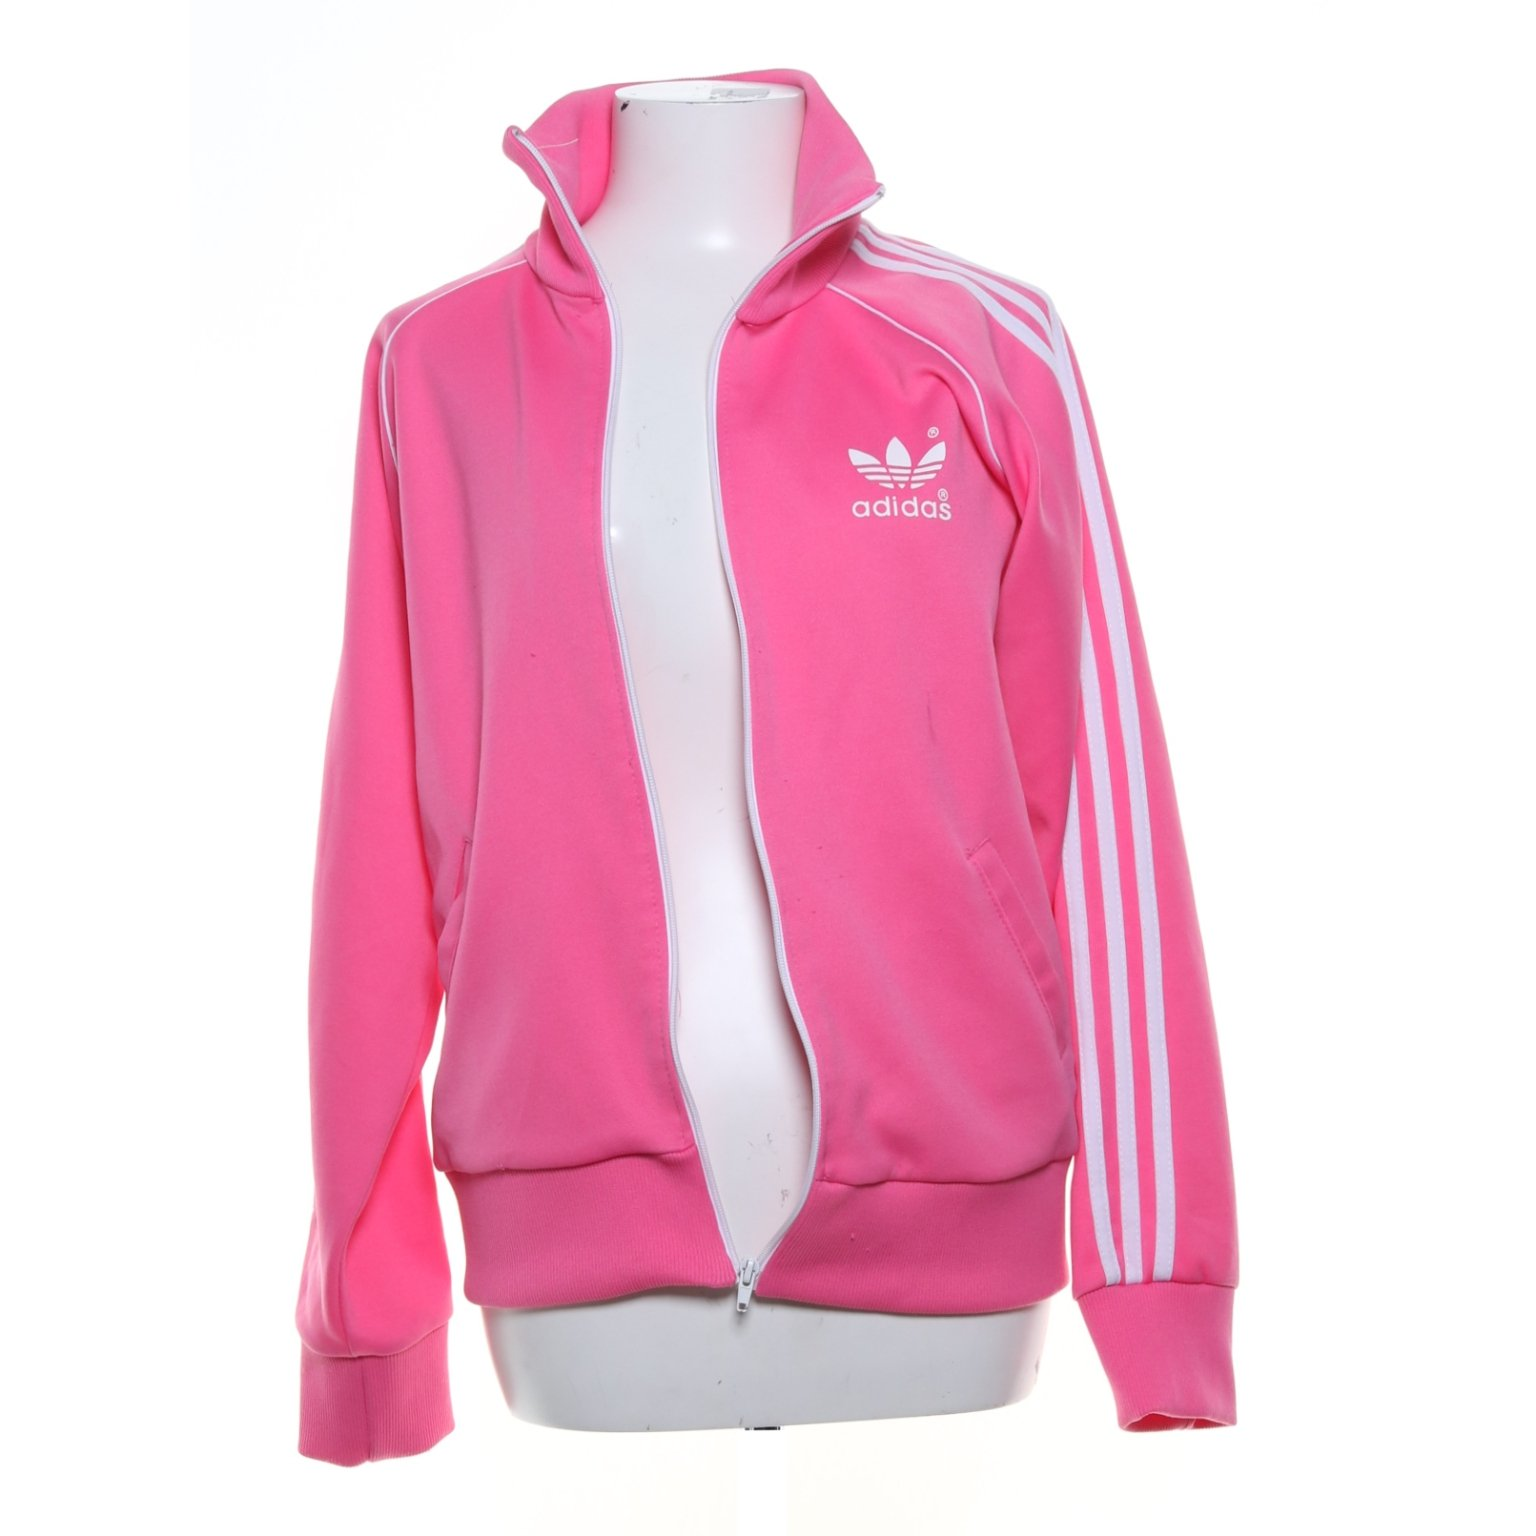 billiga adidas superstars, Adidas Zne Crewsweat tröja Svart